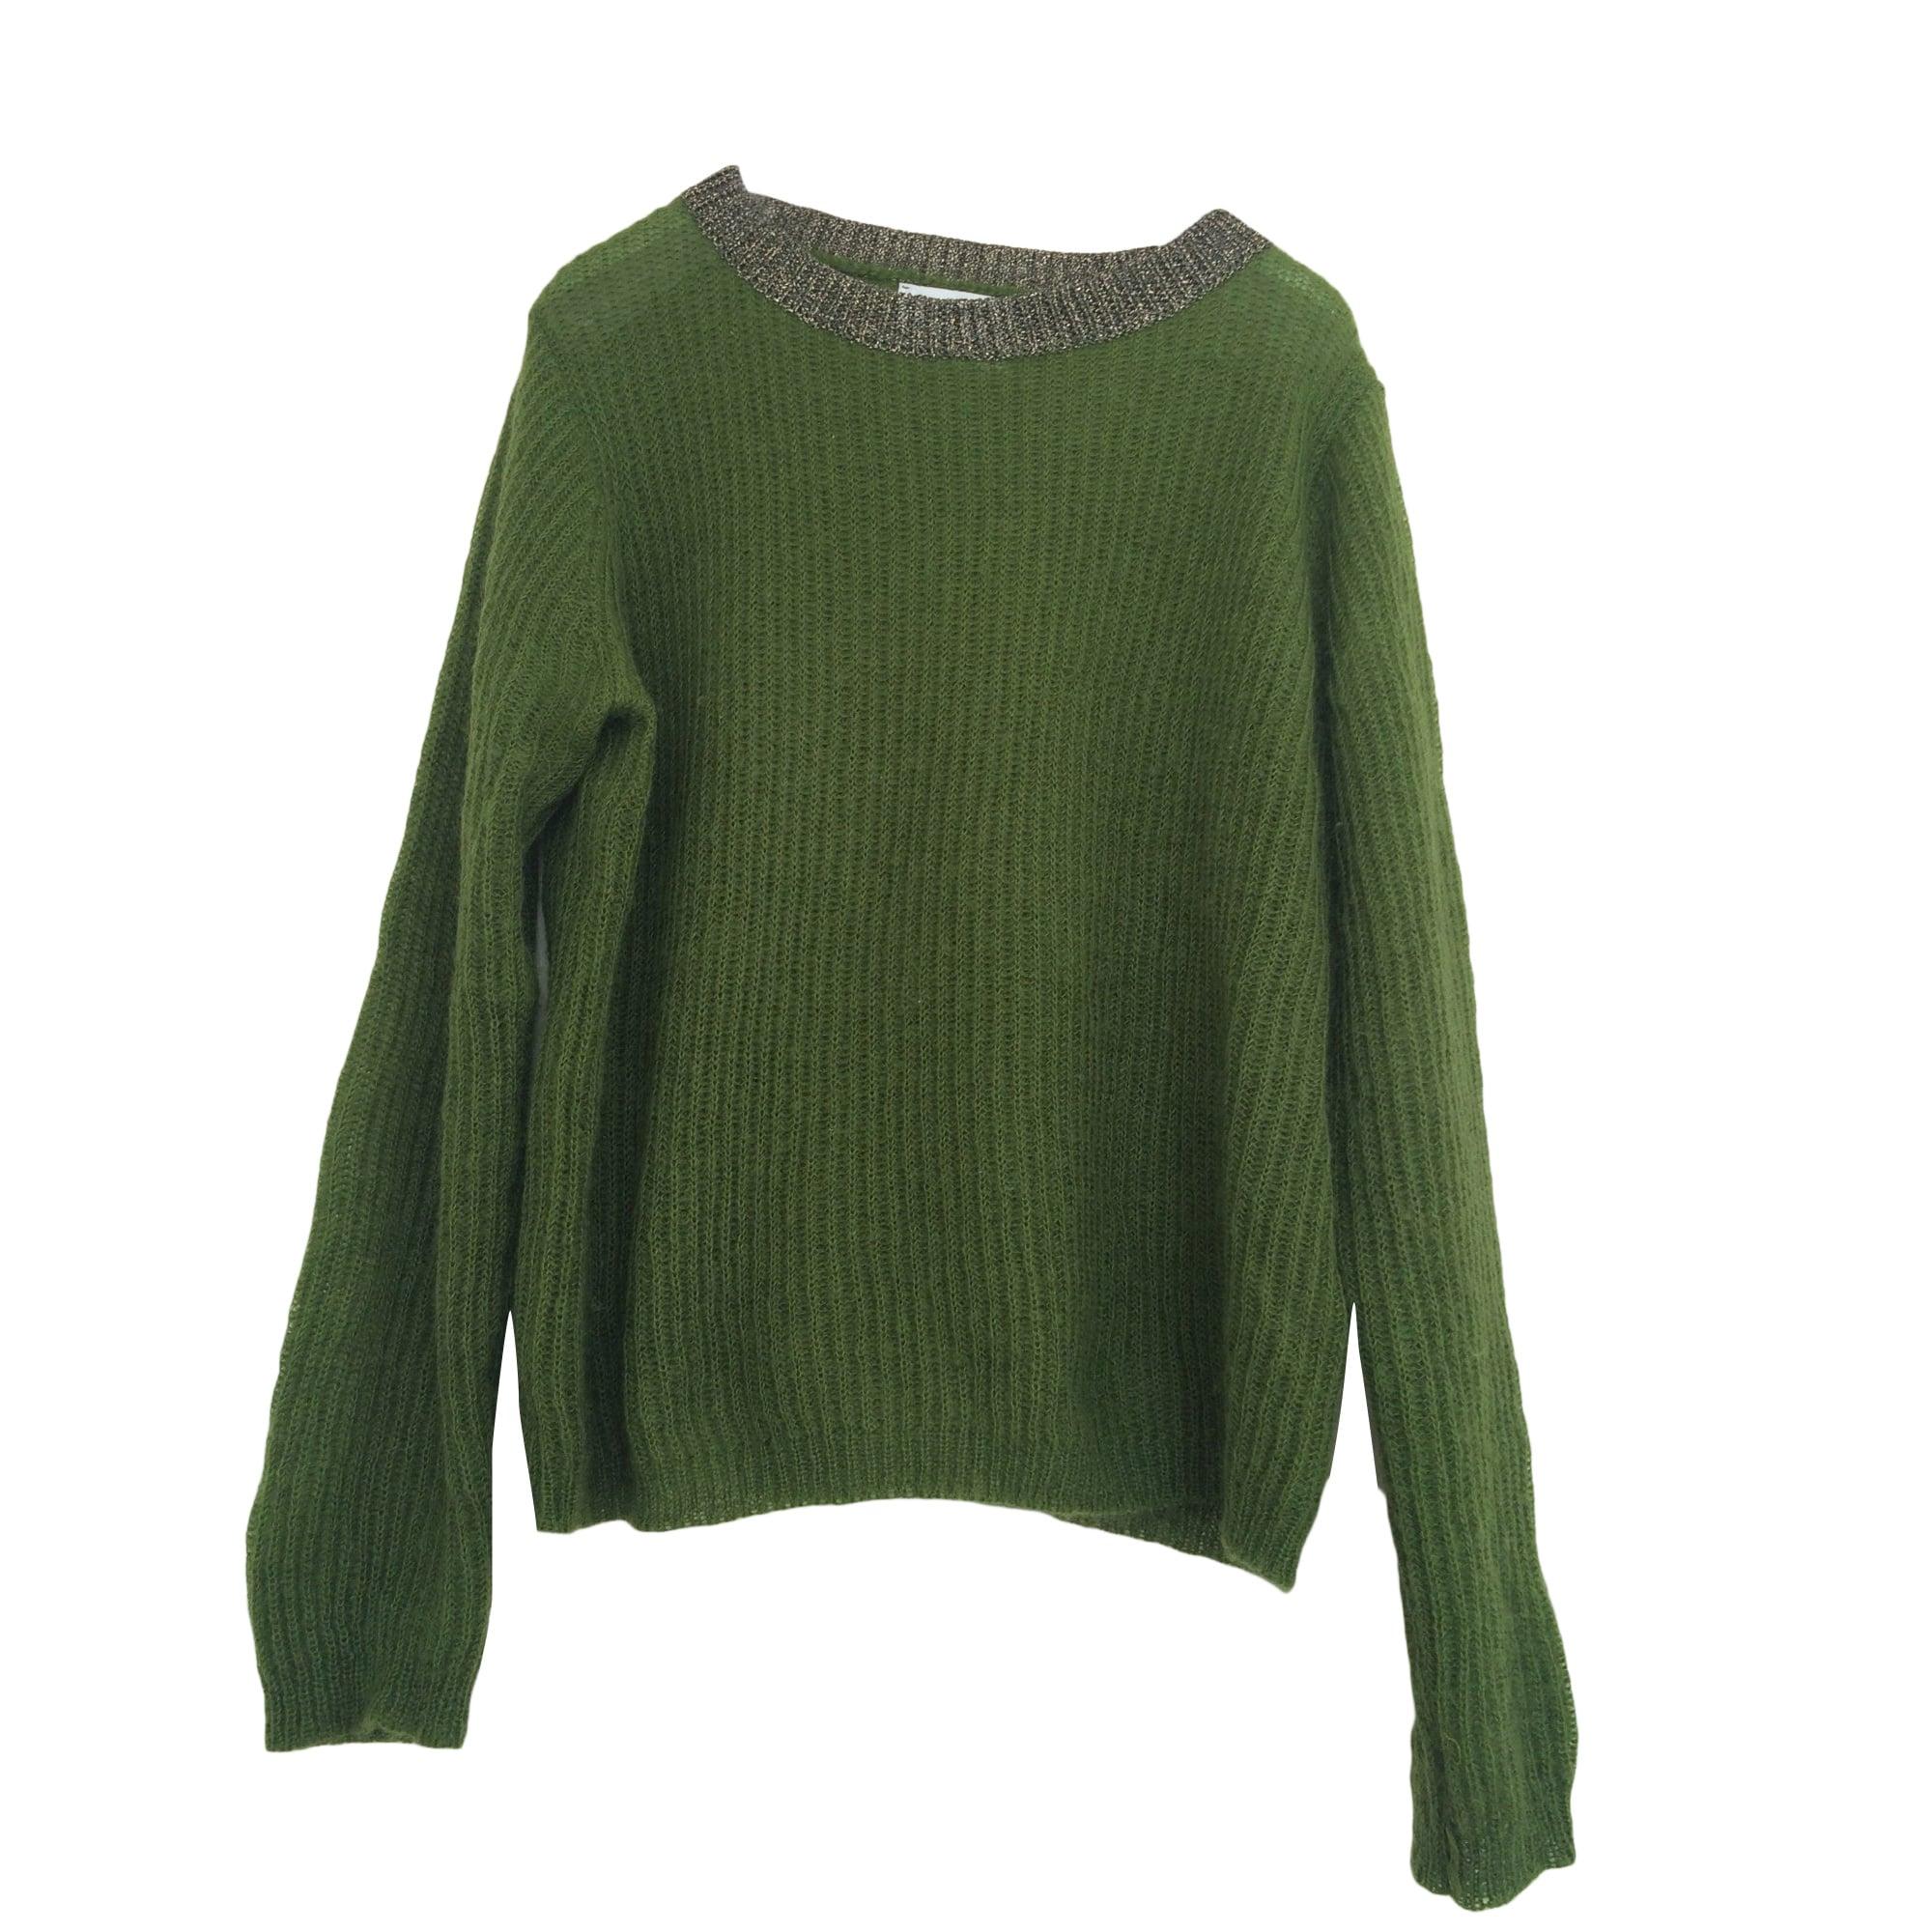 Pull ESSENTIEL ANTWERP 38 (M, T2) vert vendu